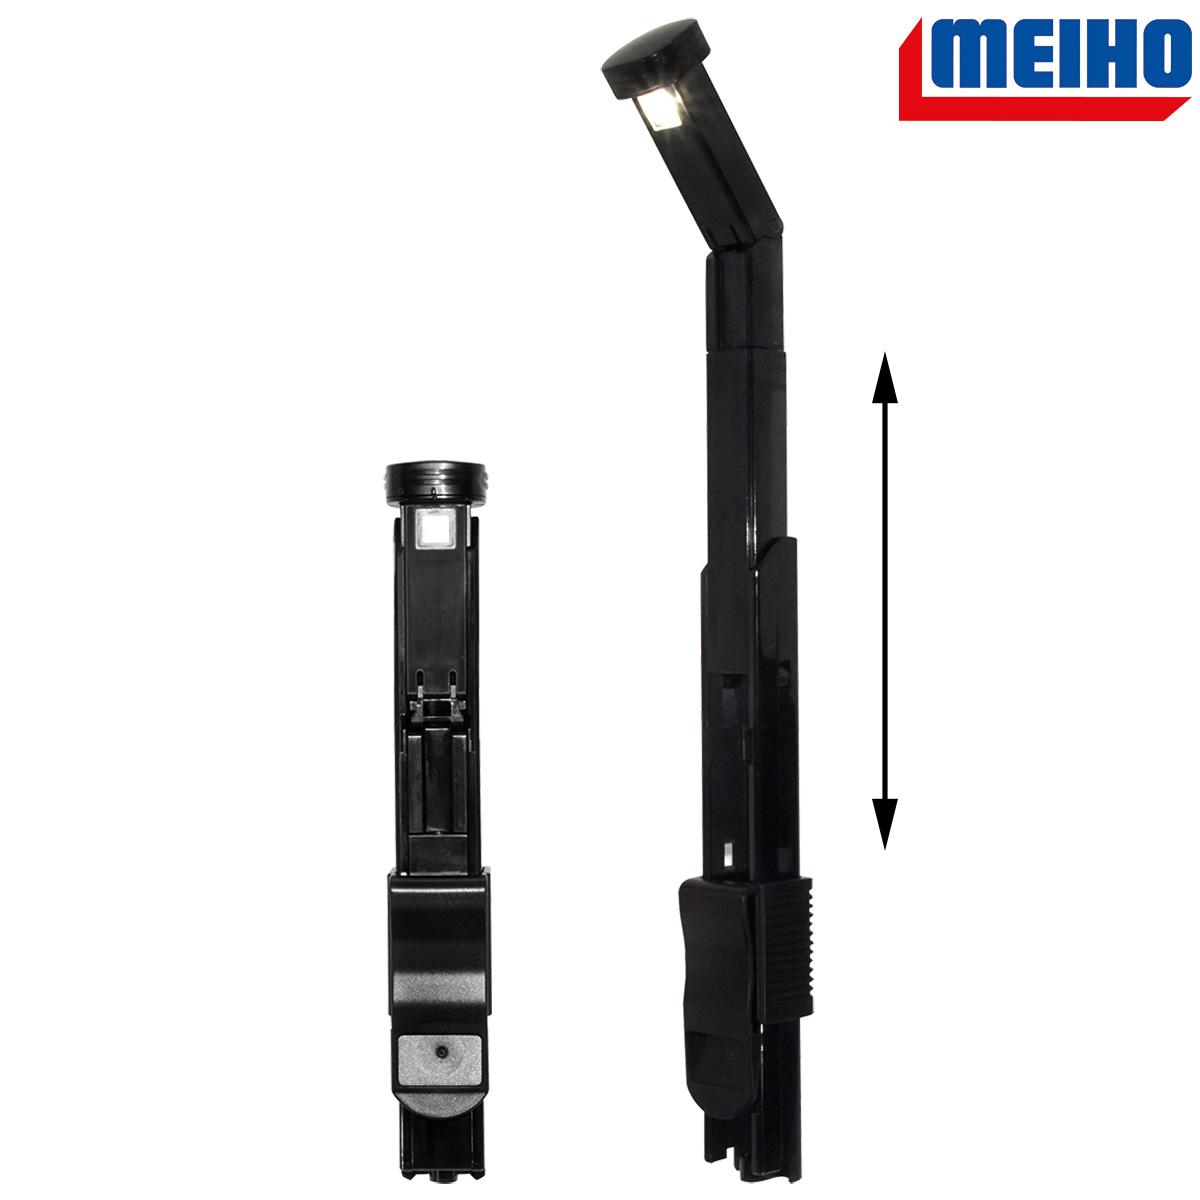 "MEIHO ""BM-LIGHT YF-9100"" LED-Lampe für MEIHO BOXEN"